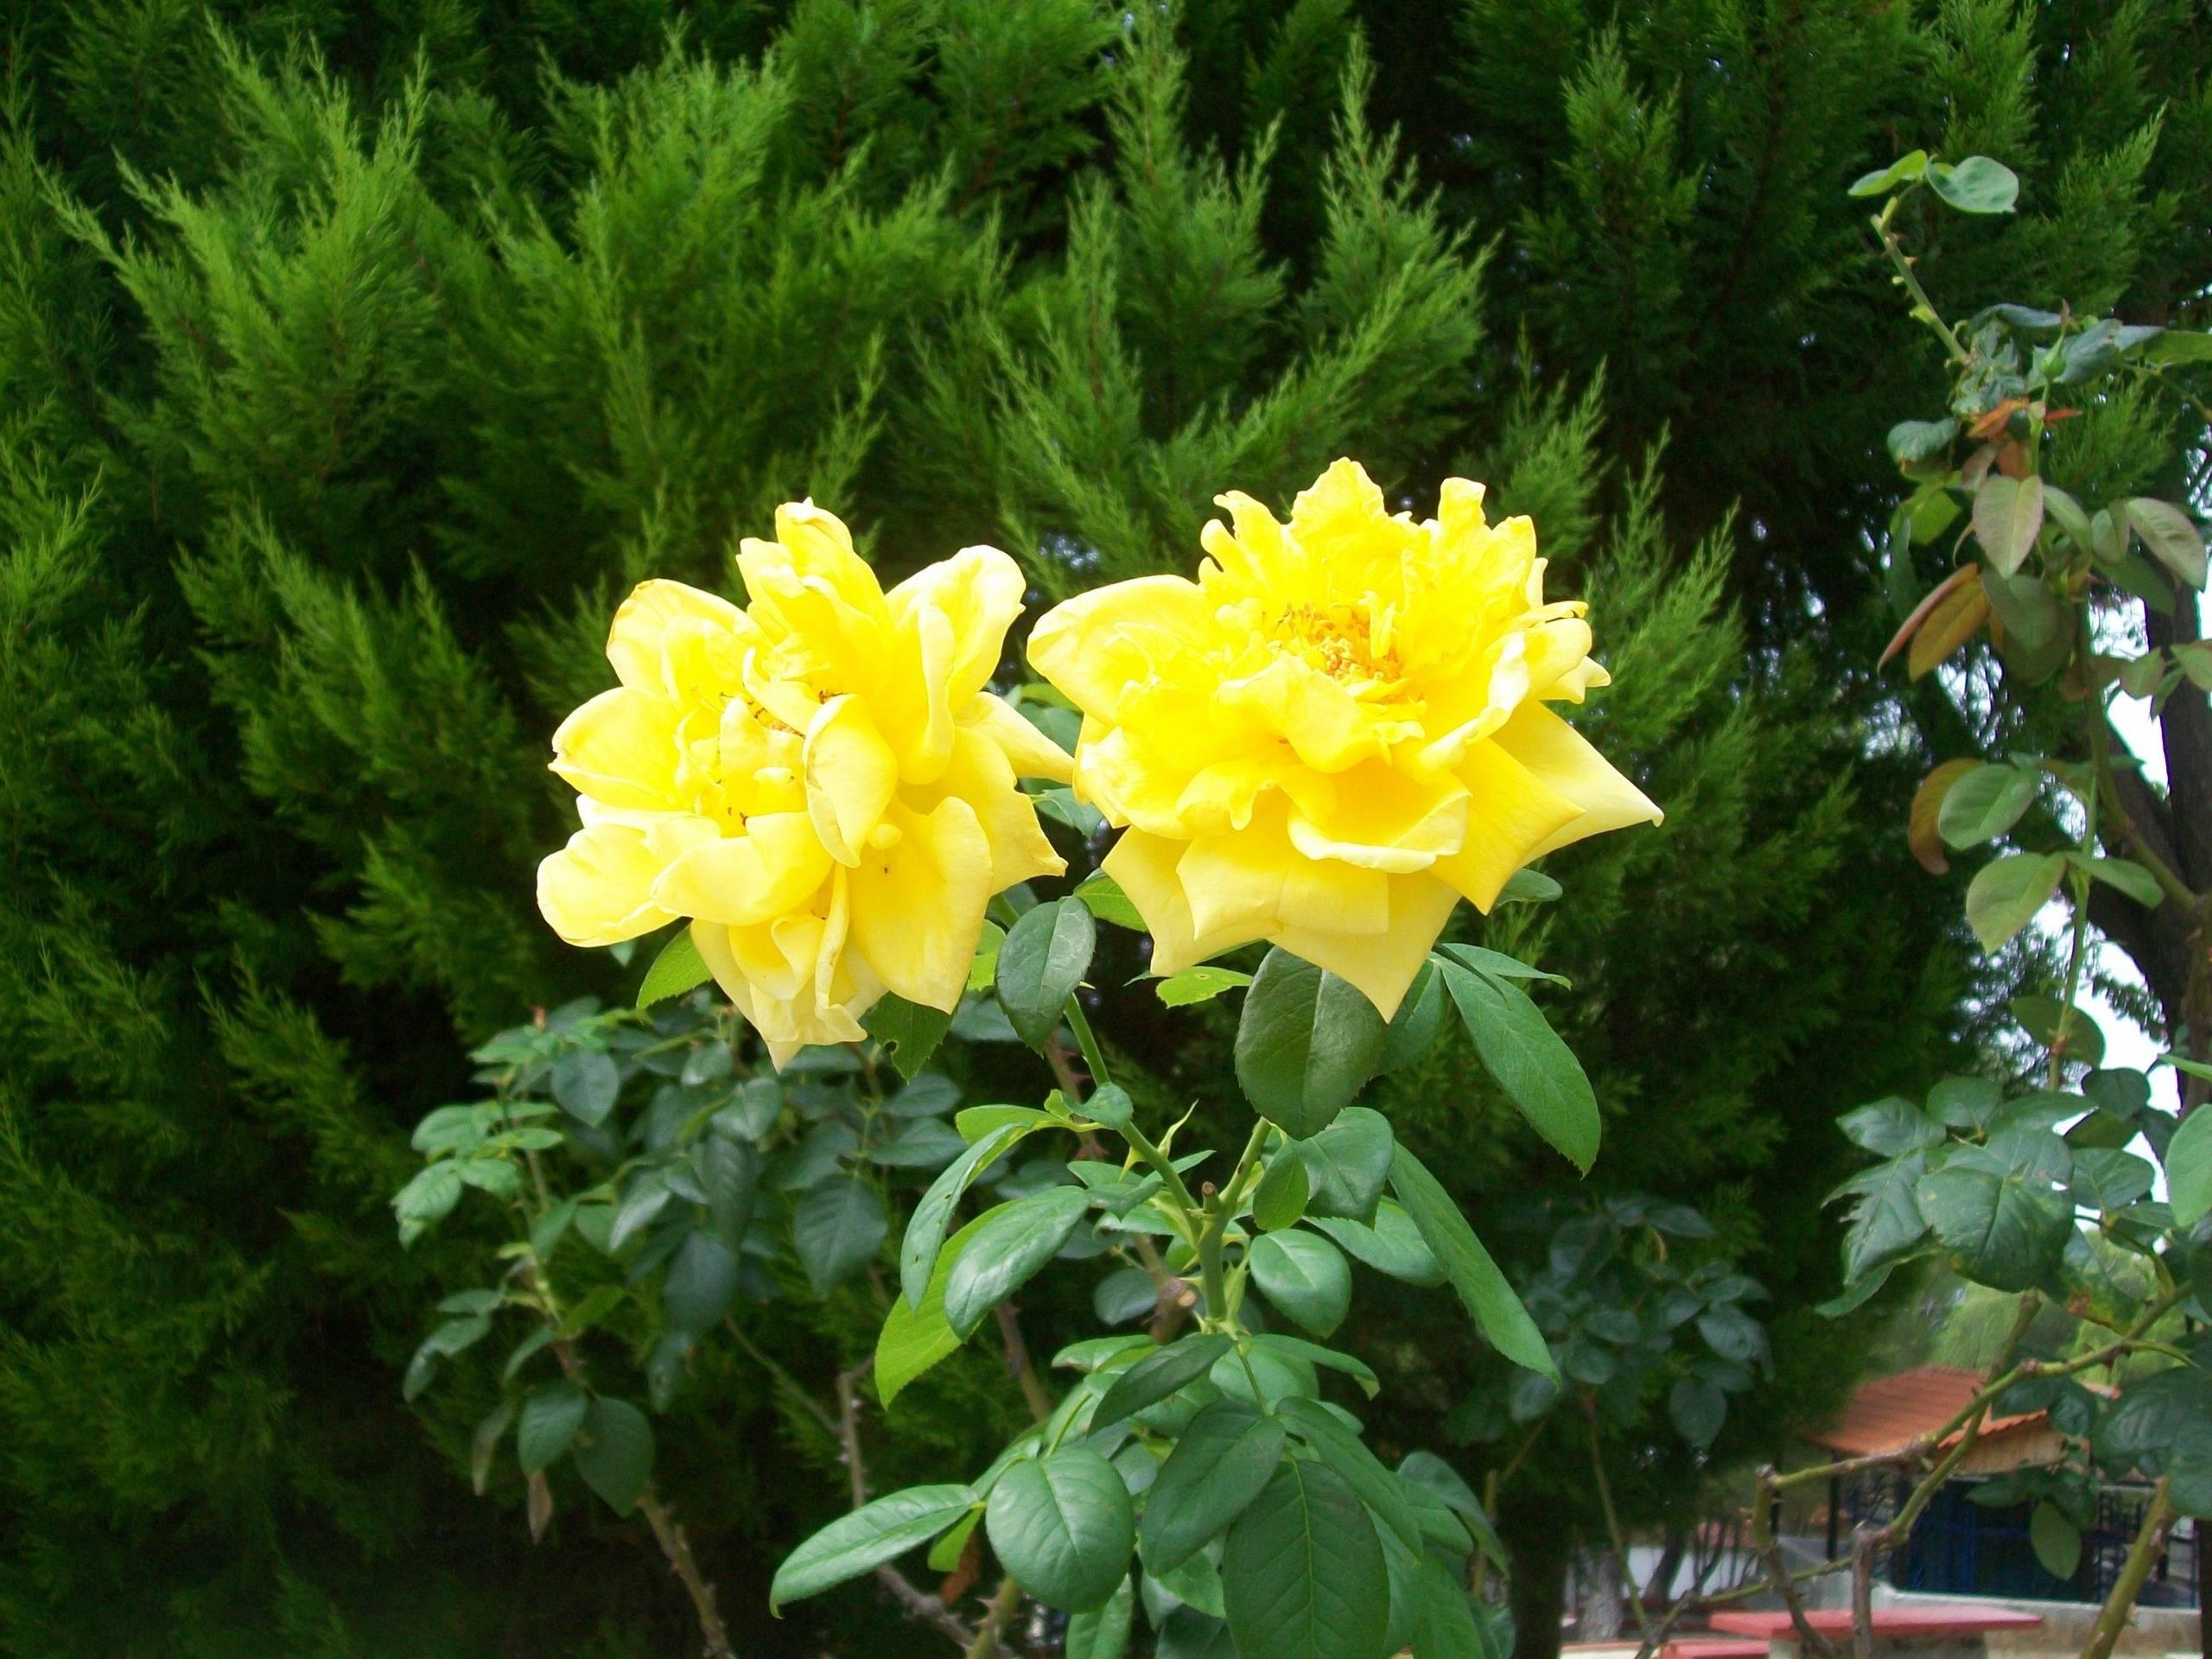 Hd wallpaper yellow rose - Yellow Rose Widescreen Desktop Wallpaper Hd Wallpapers